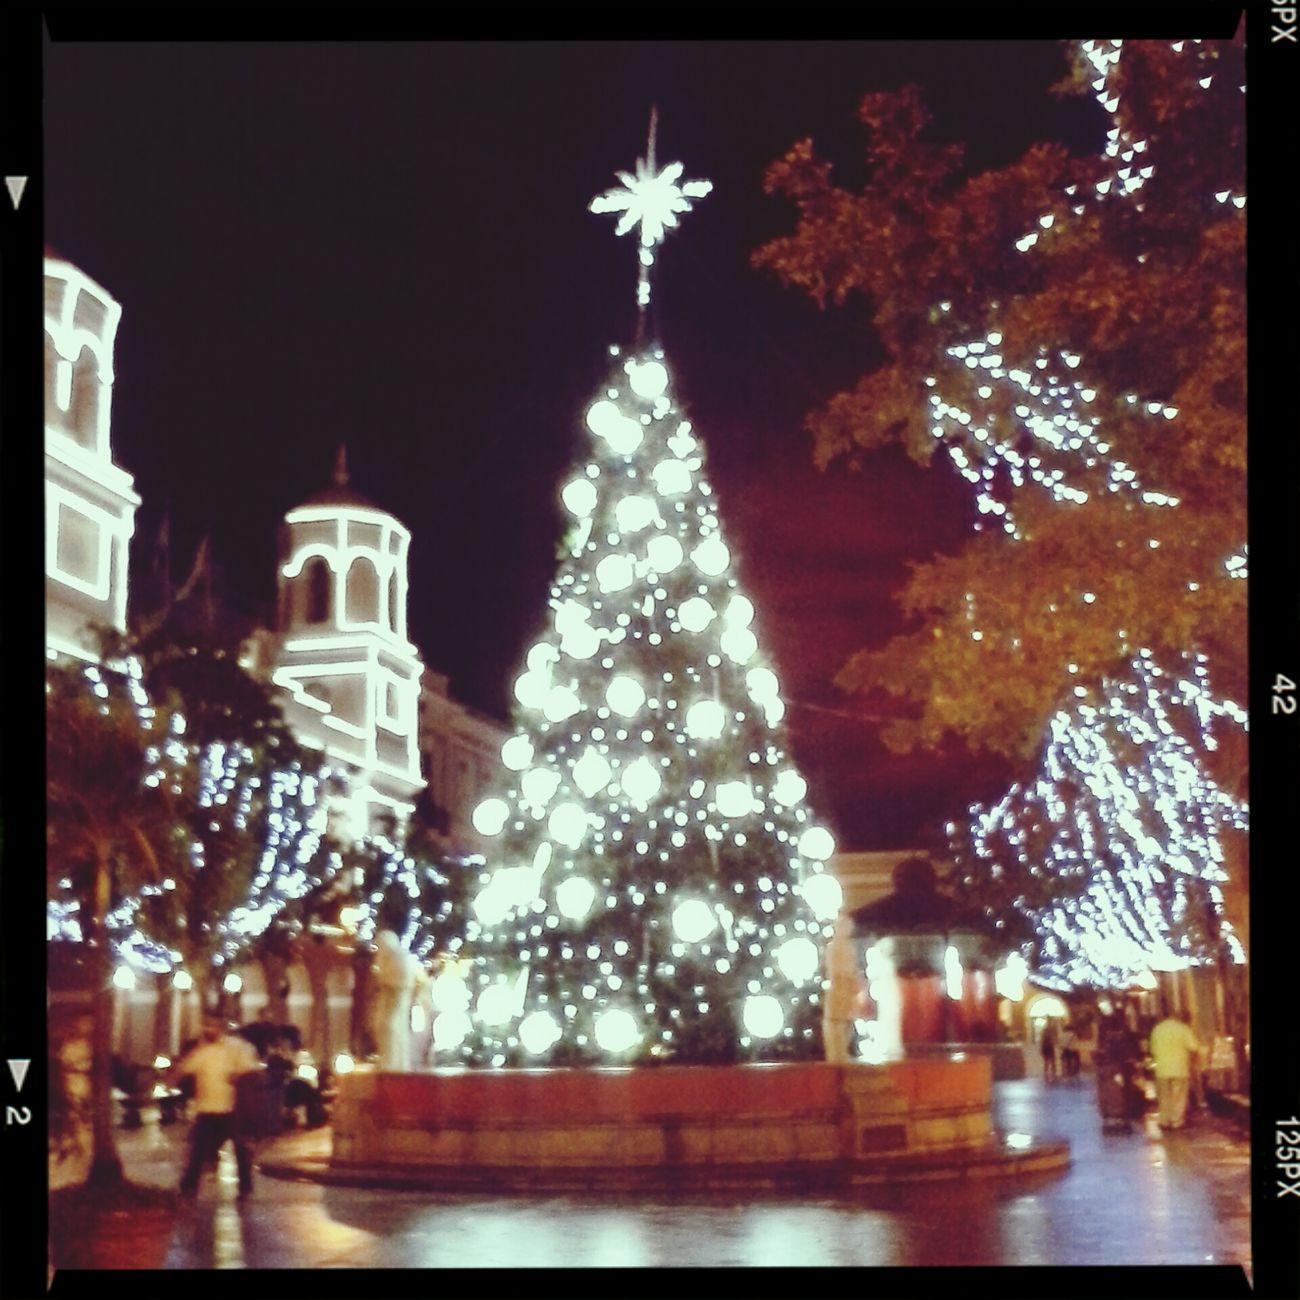 Christmas♥ Oldsanjuan Navidadboricua ChristmastreeLoveit